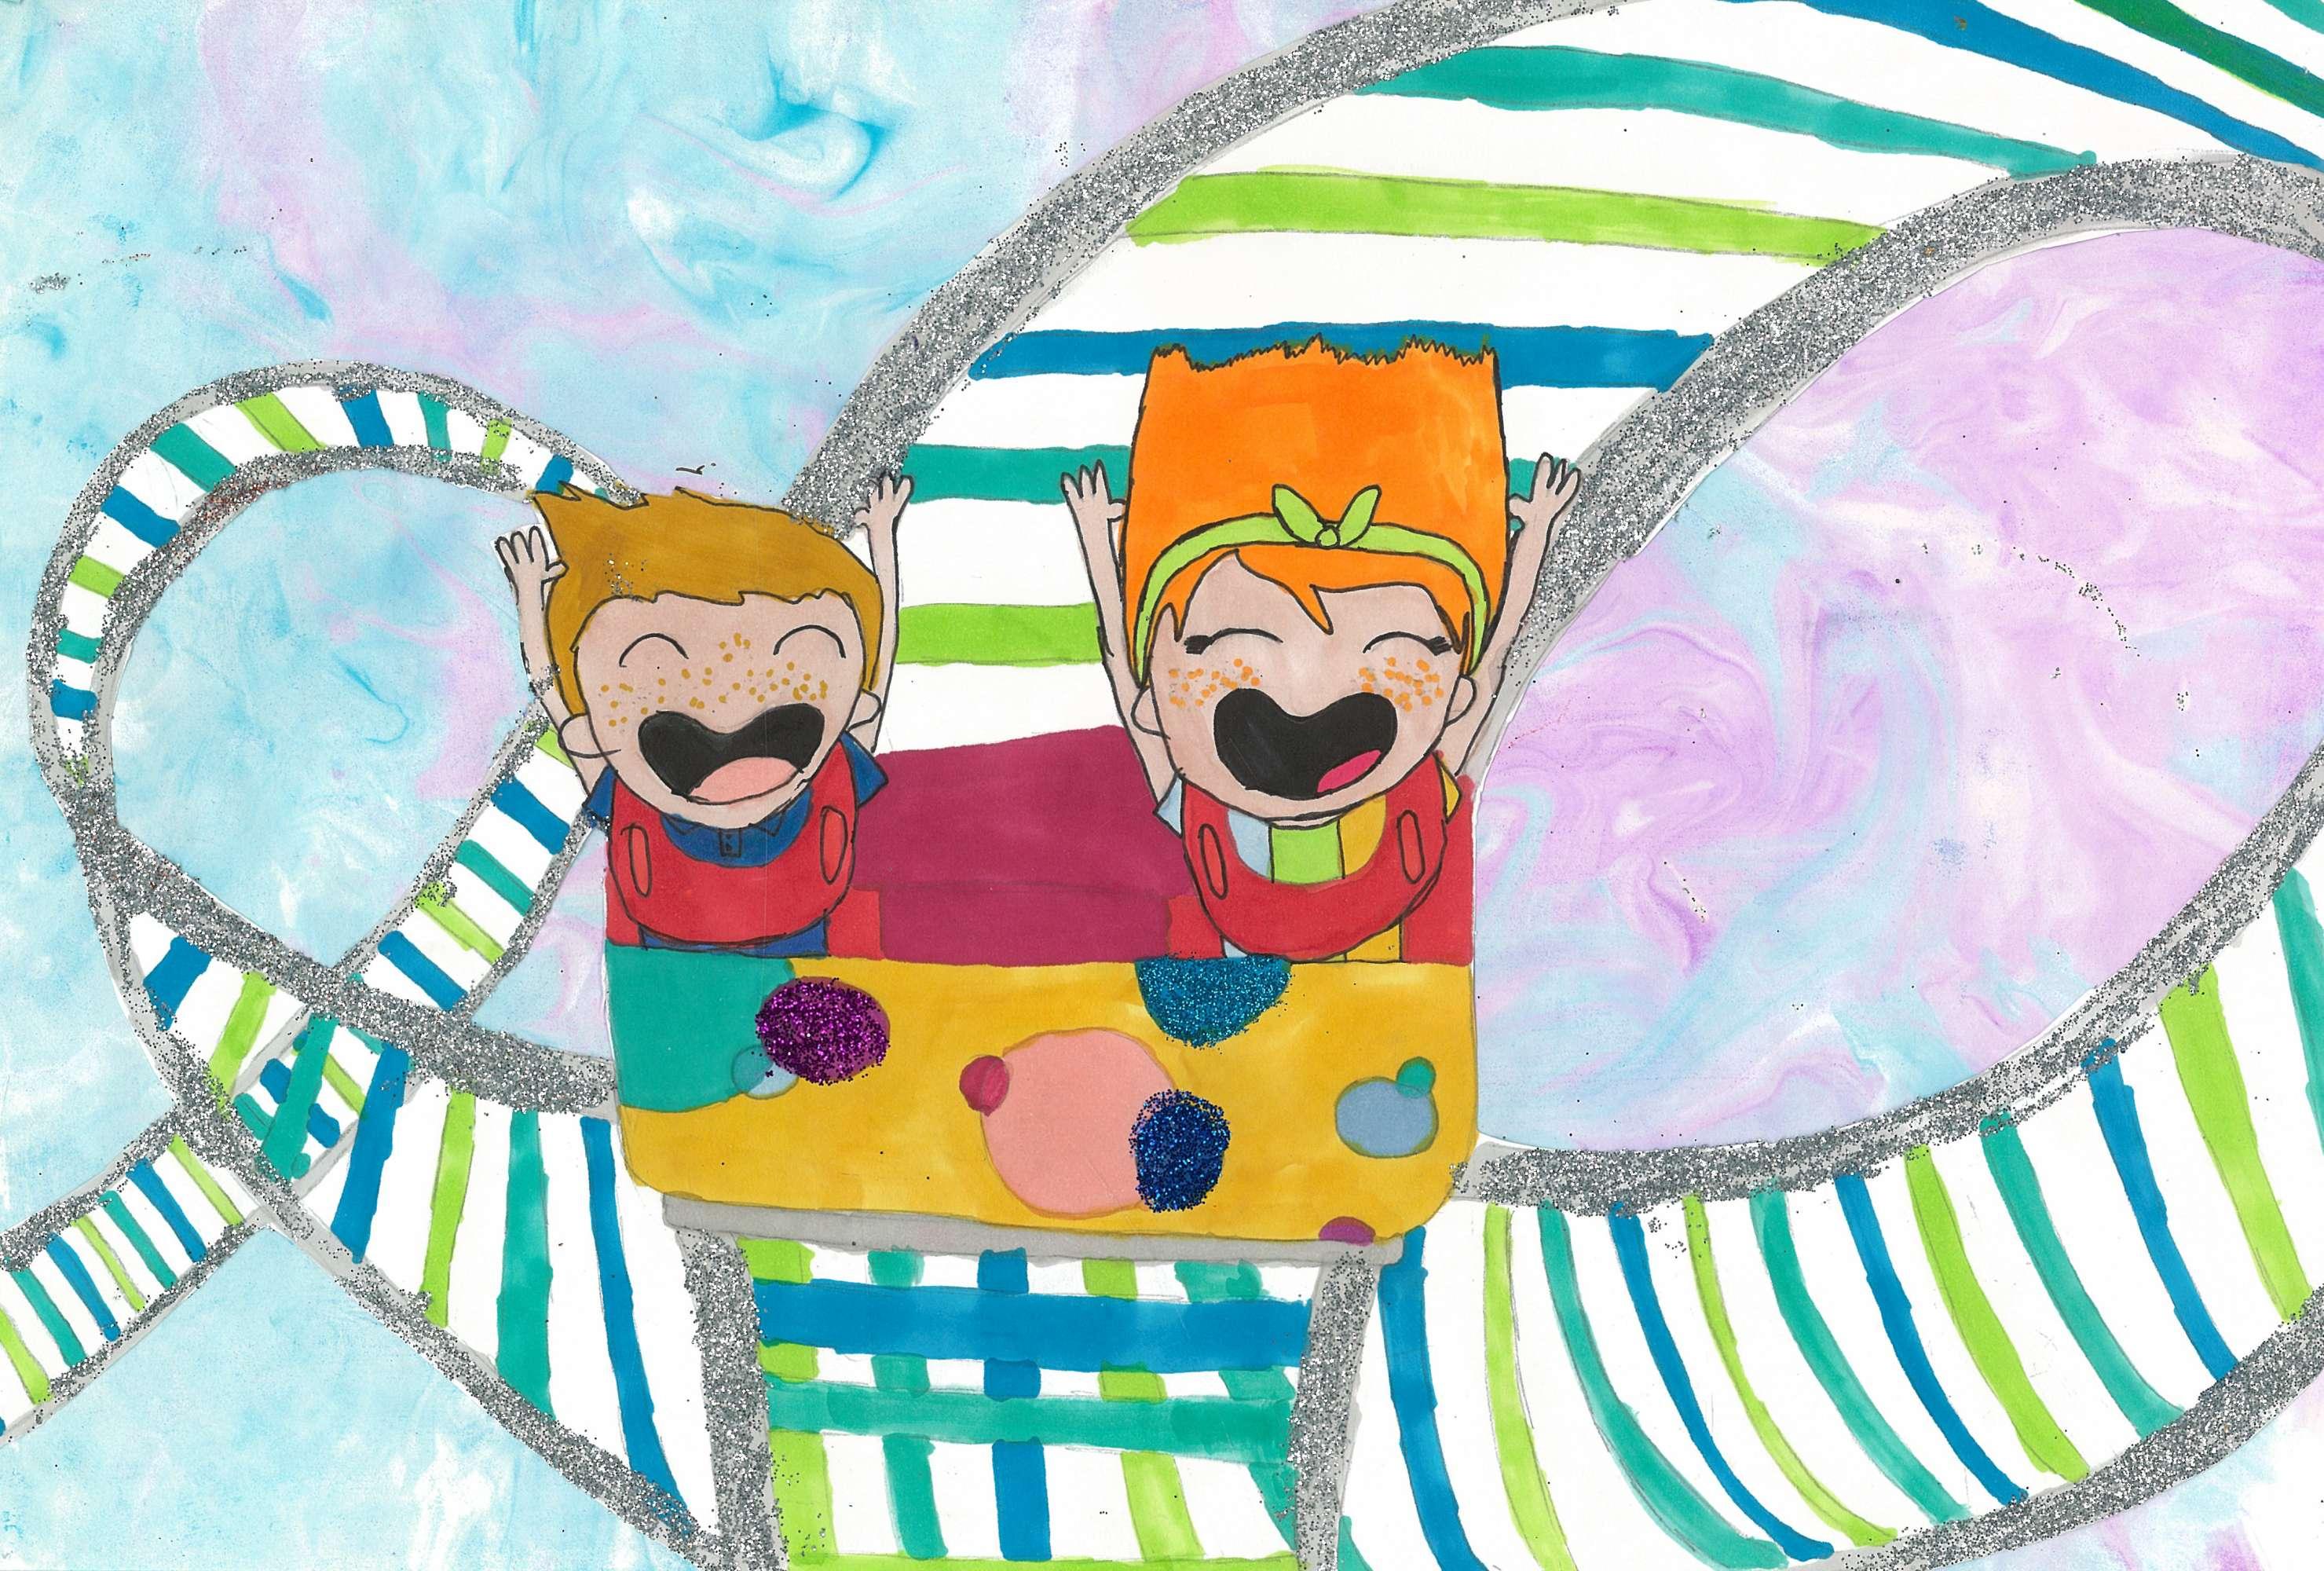 Glittery Roller Coaster